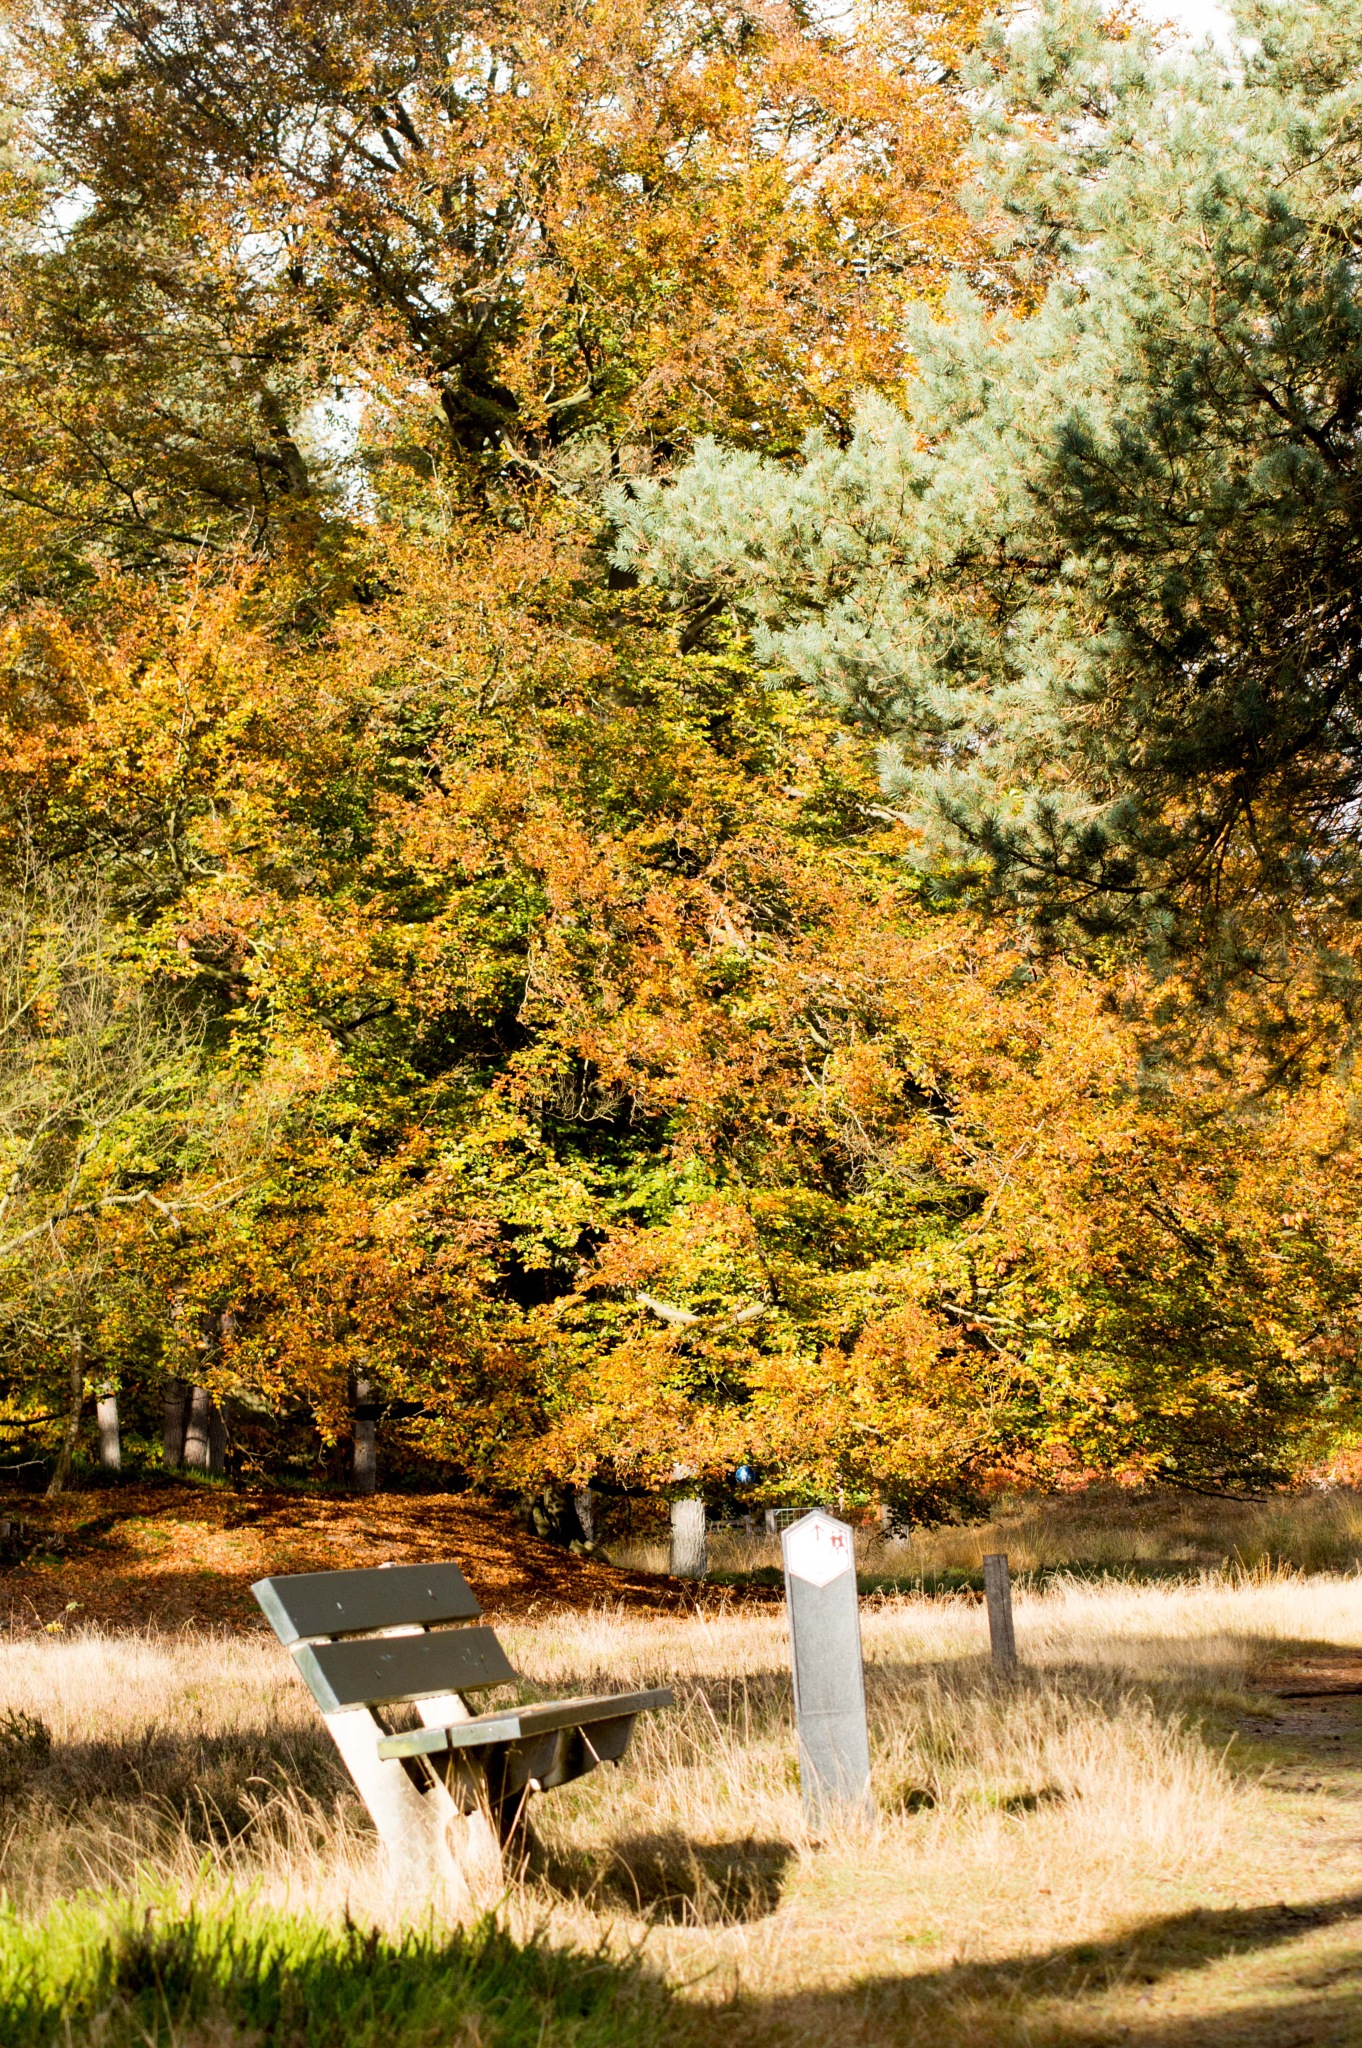 Autumn tree by missjoy86